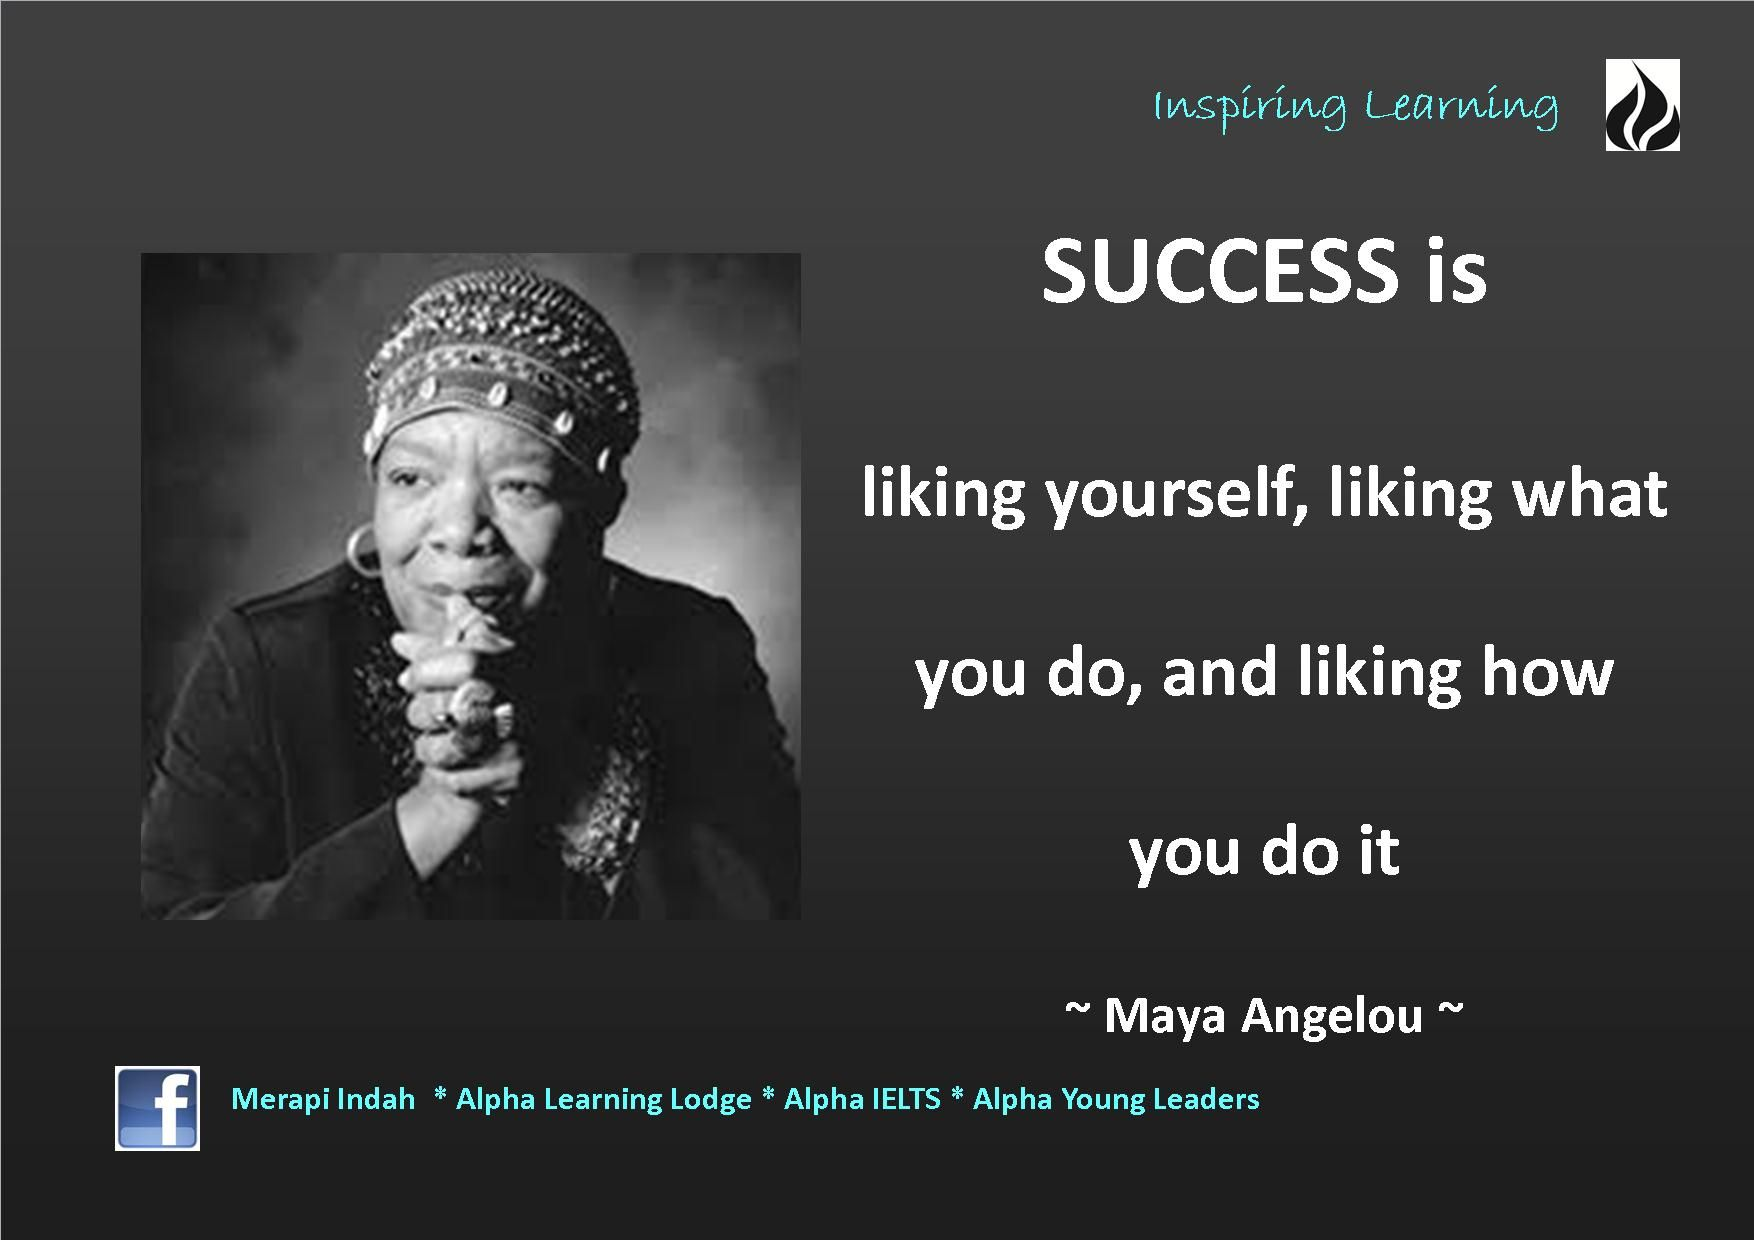 Famous Leadership Quotes Quote  Maya Angelou  Maya Angelou Inspirational And Social